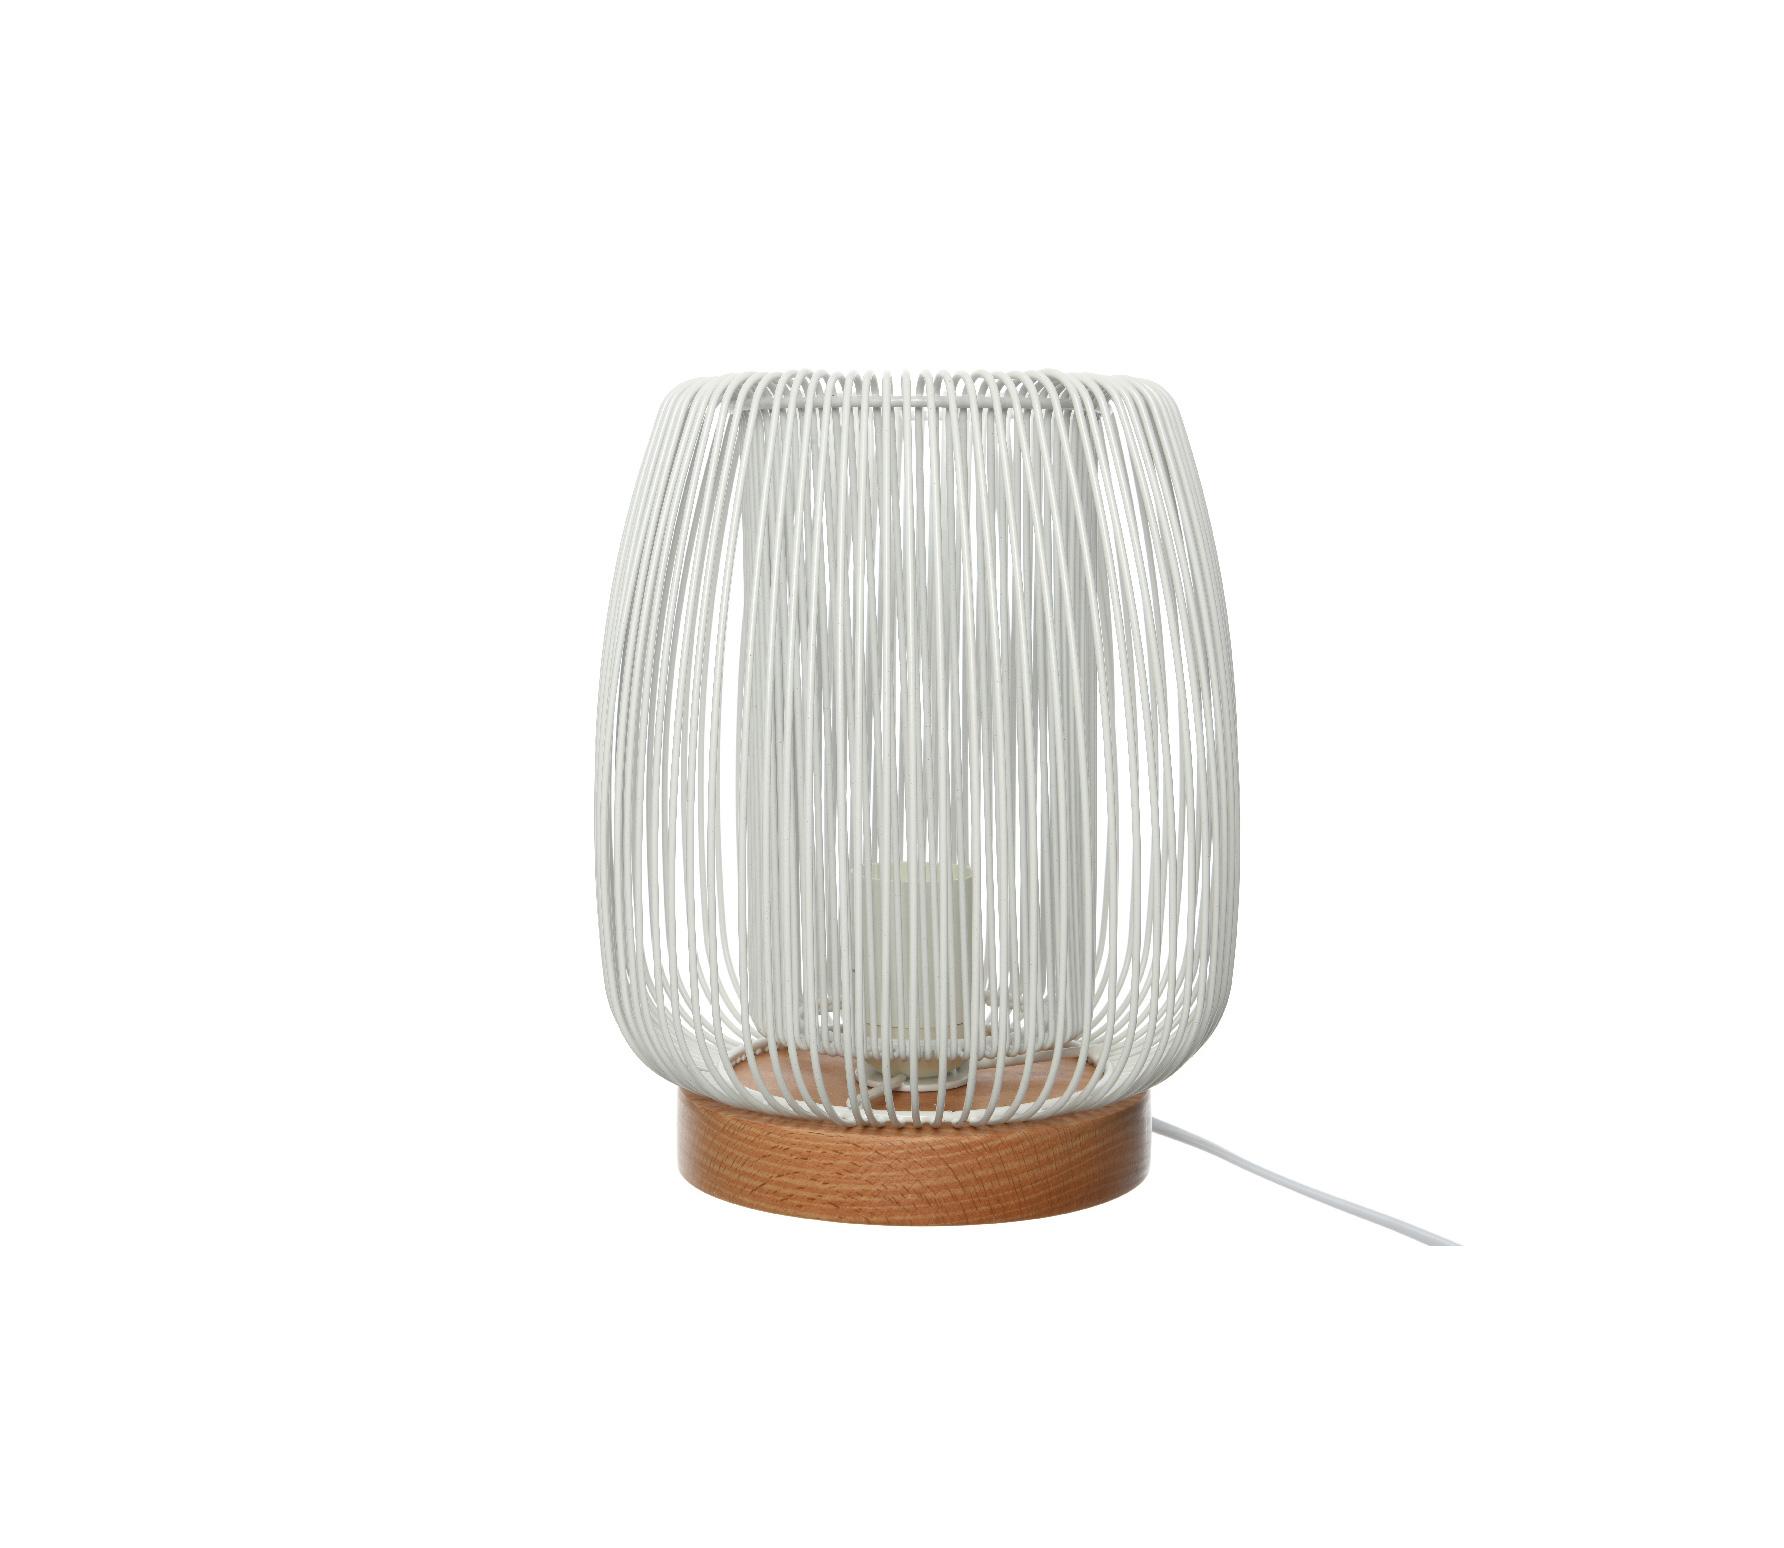 Tafellamp rond wit ø19.5cm ijzer